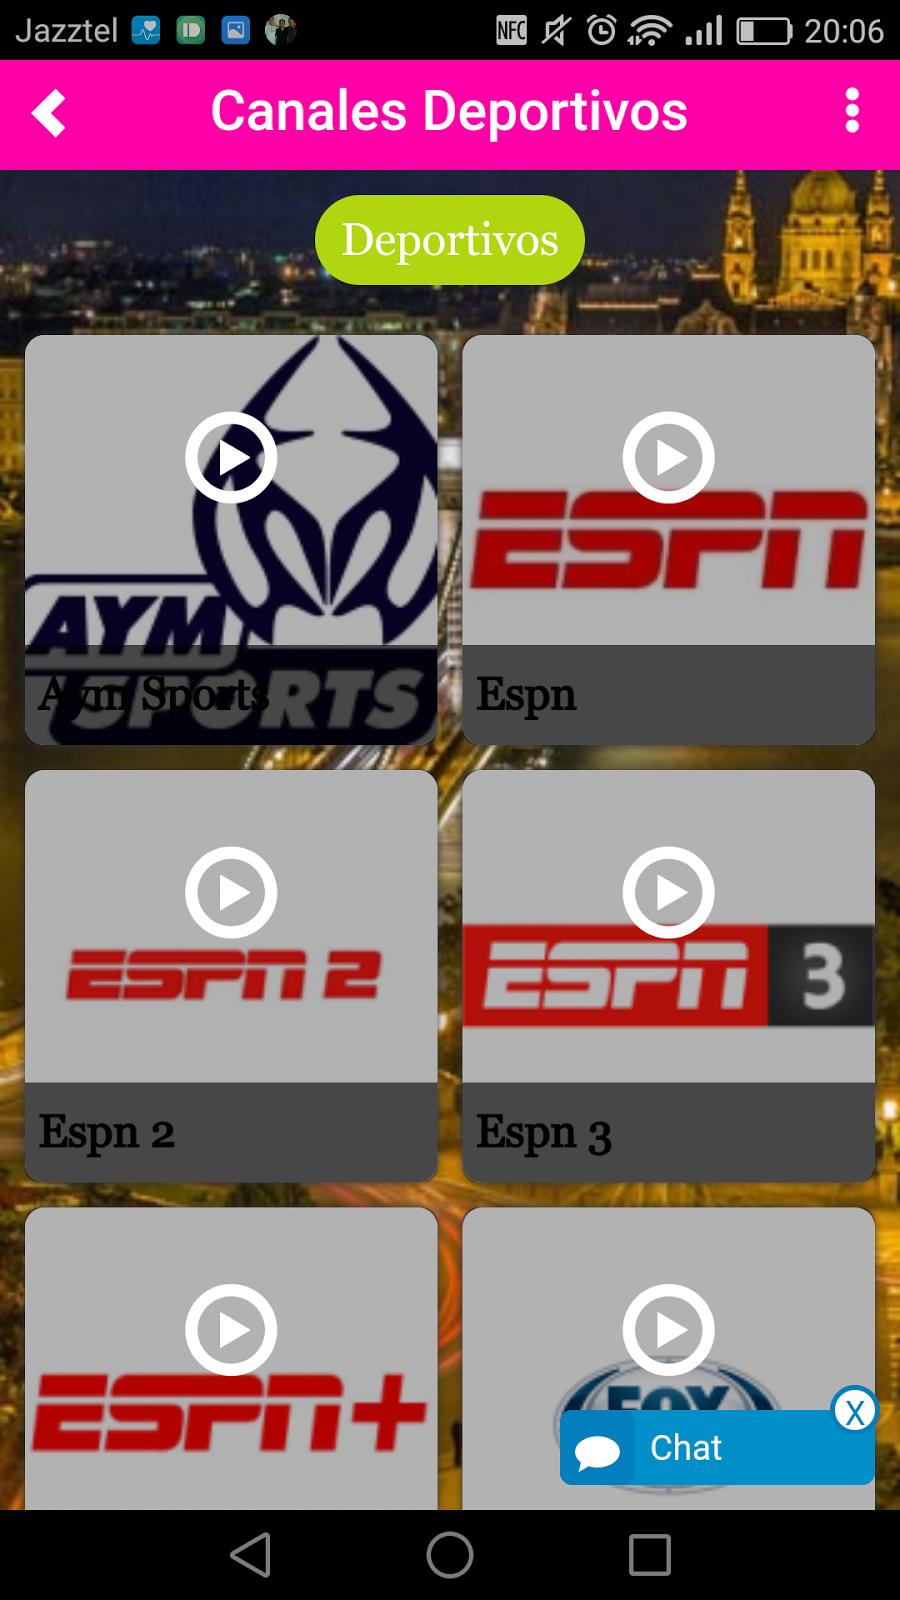 Aplicacion De Tv Ios Android // yseltirea gq